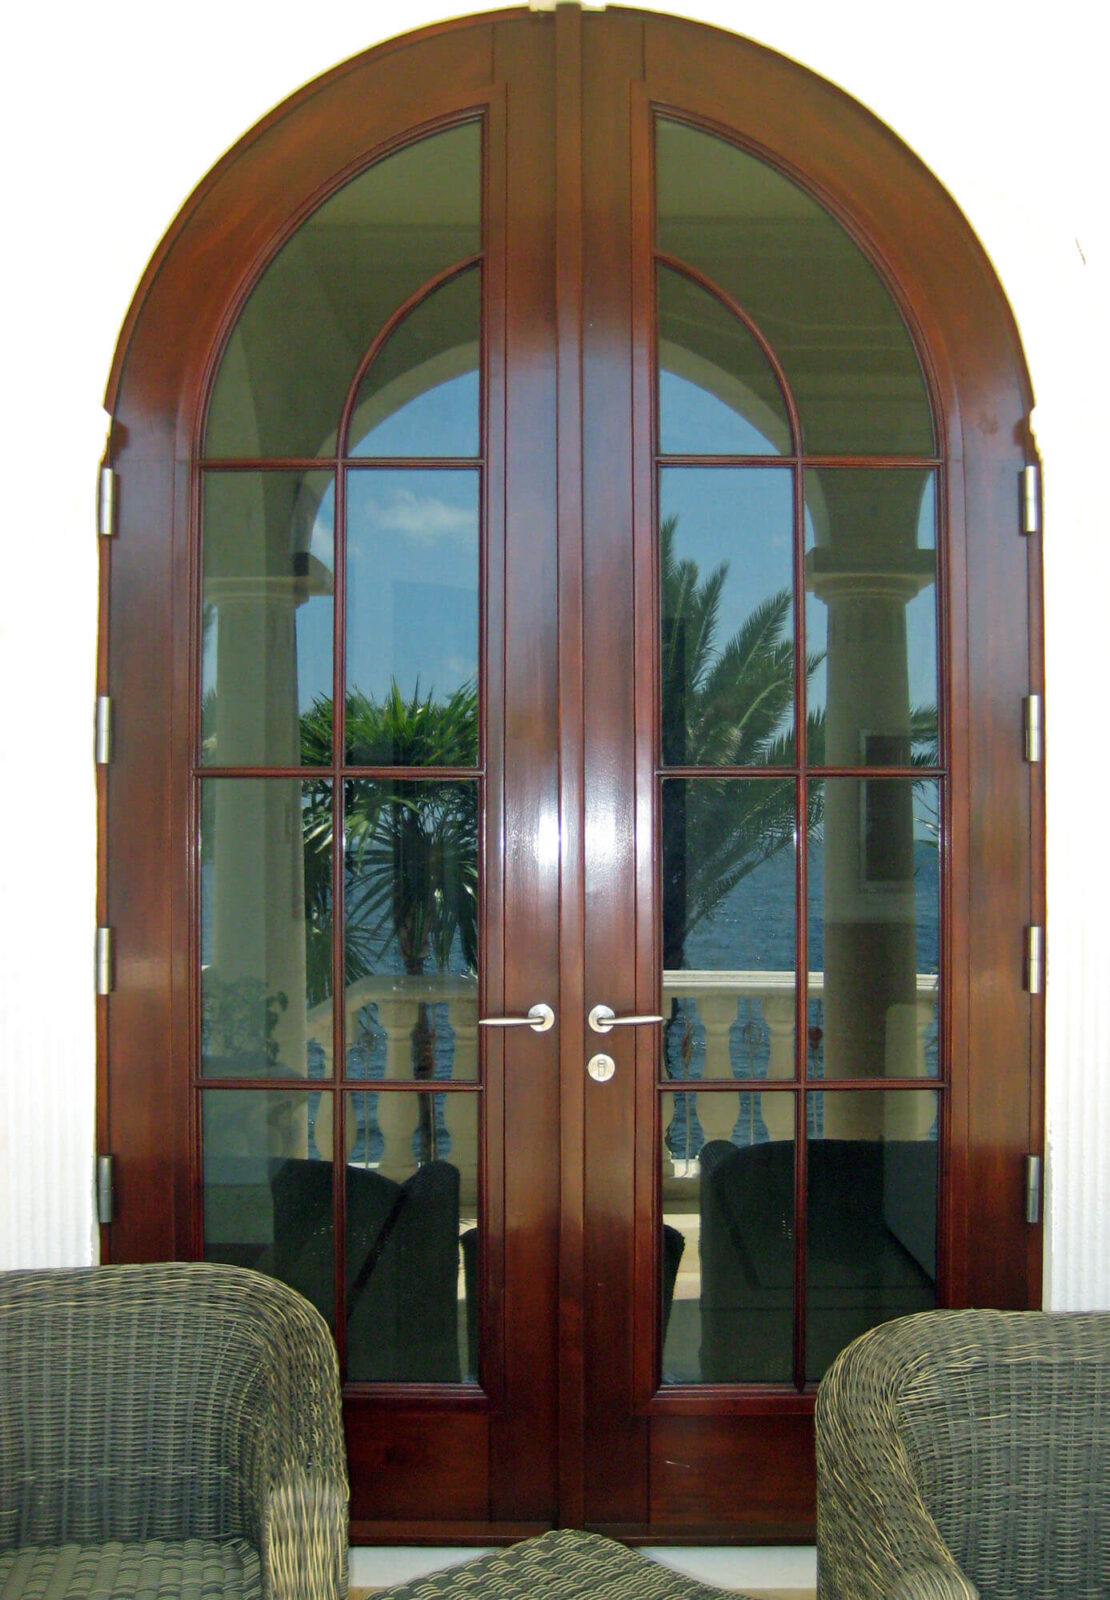 CORAL GABLES MAHOGANY FRENCH PATIO DOOR.